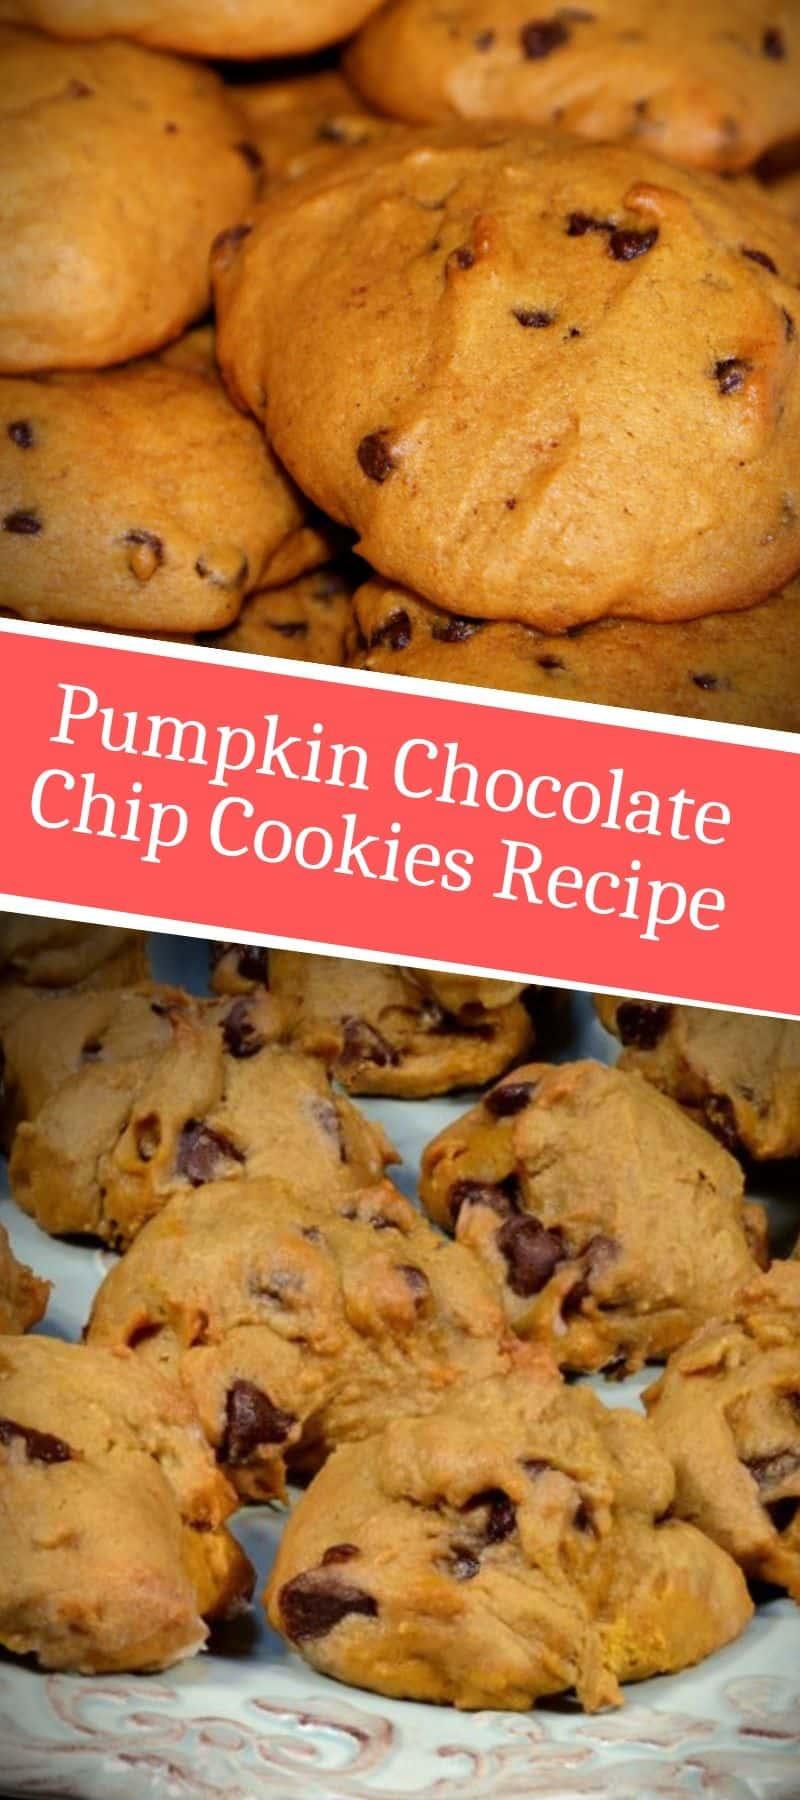 Pumpkin Chocolate Chip Cookies Recipe 3